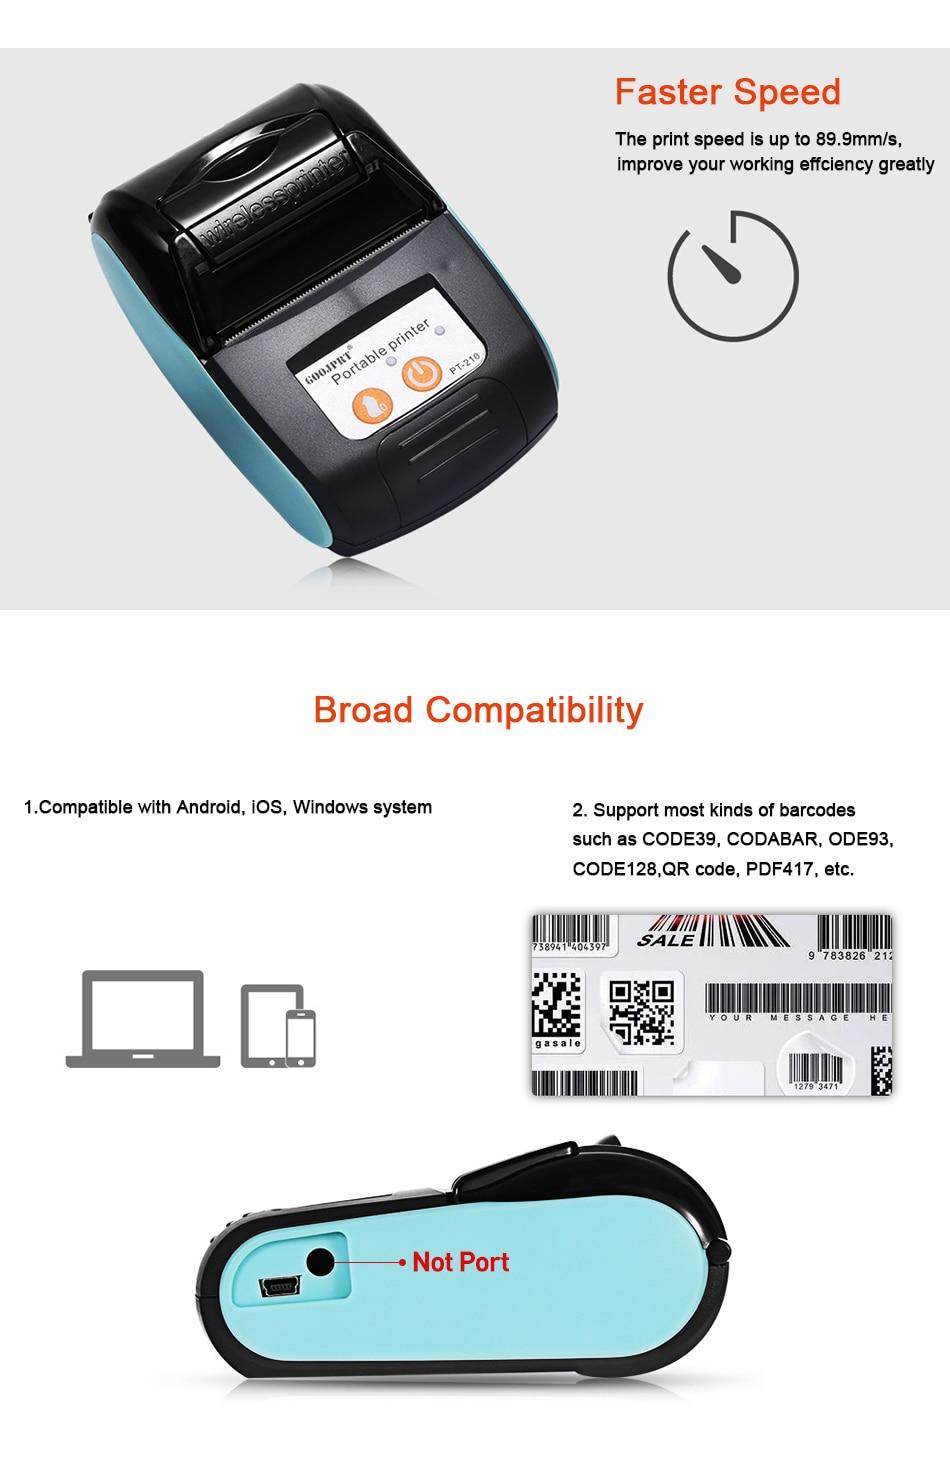 Wireless Thermal Printer